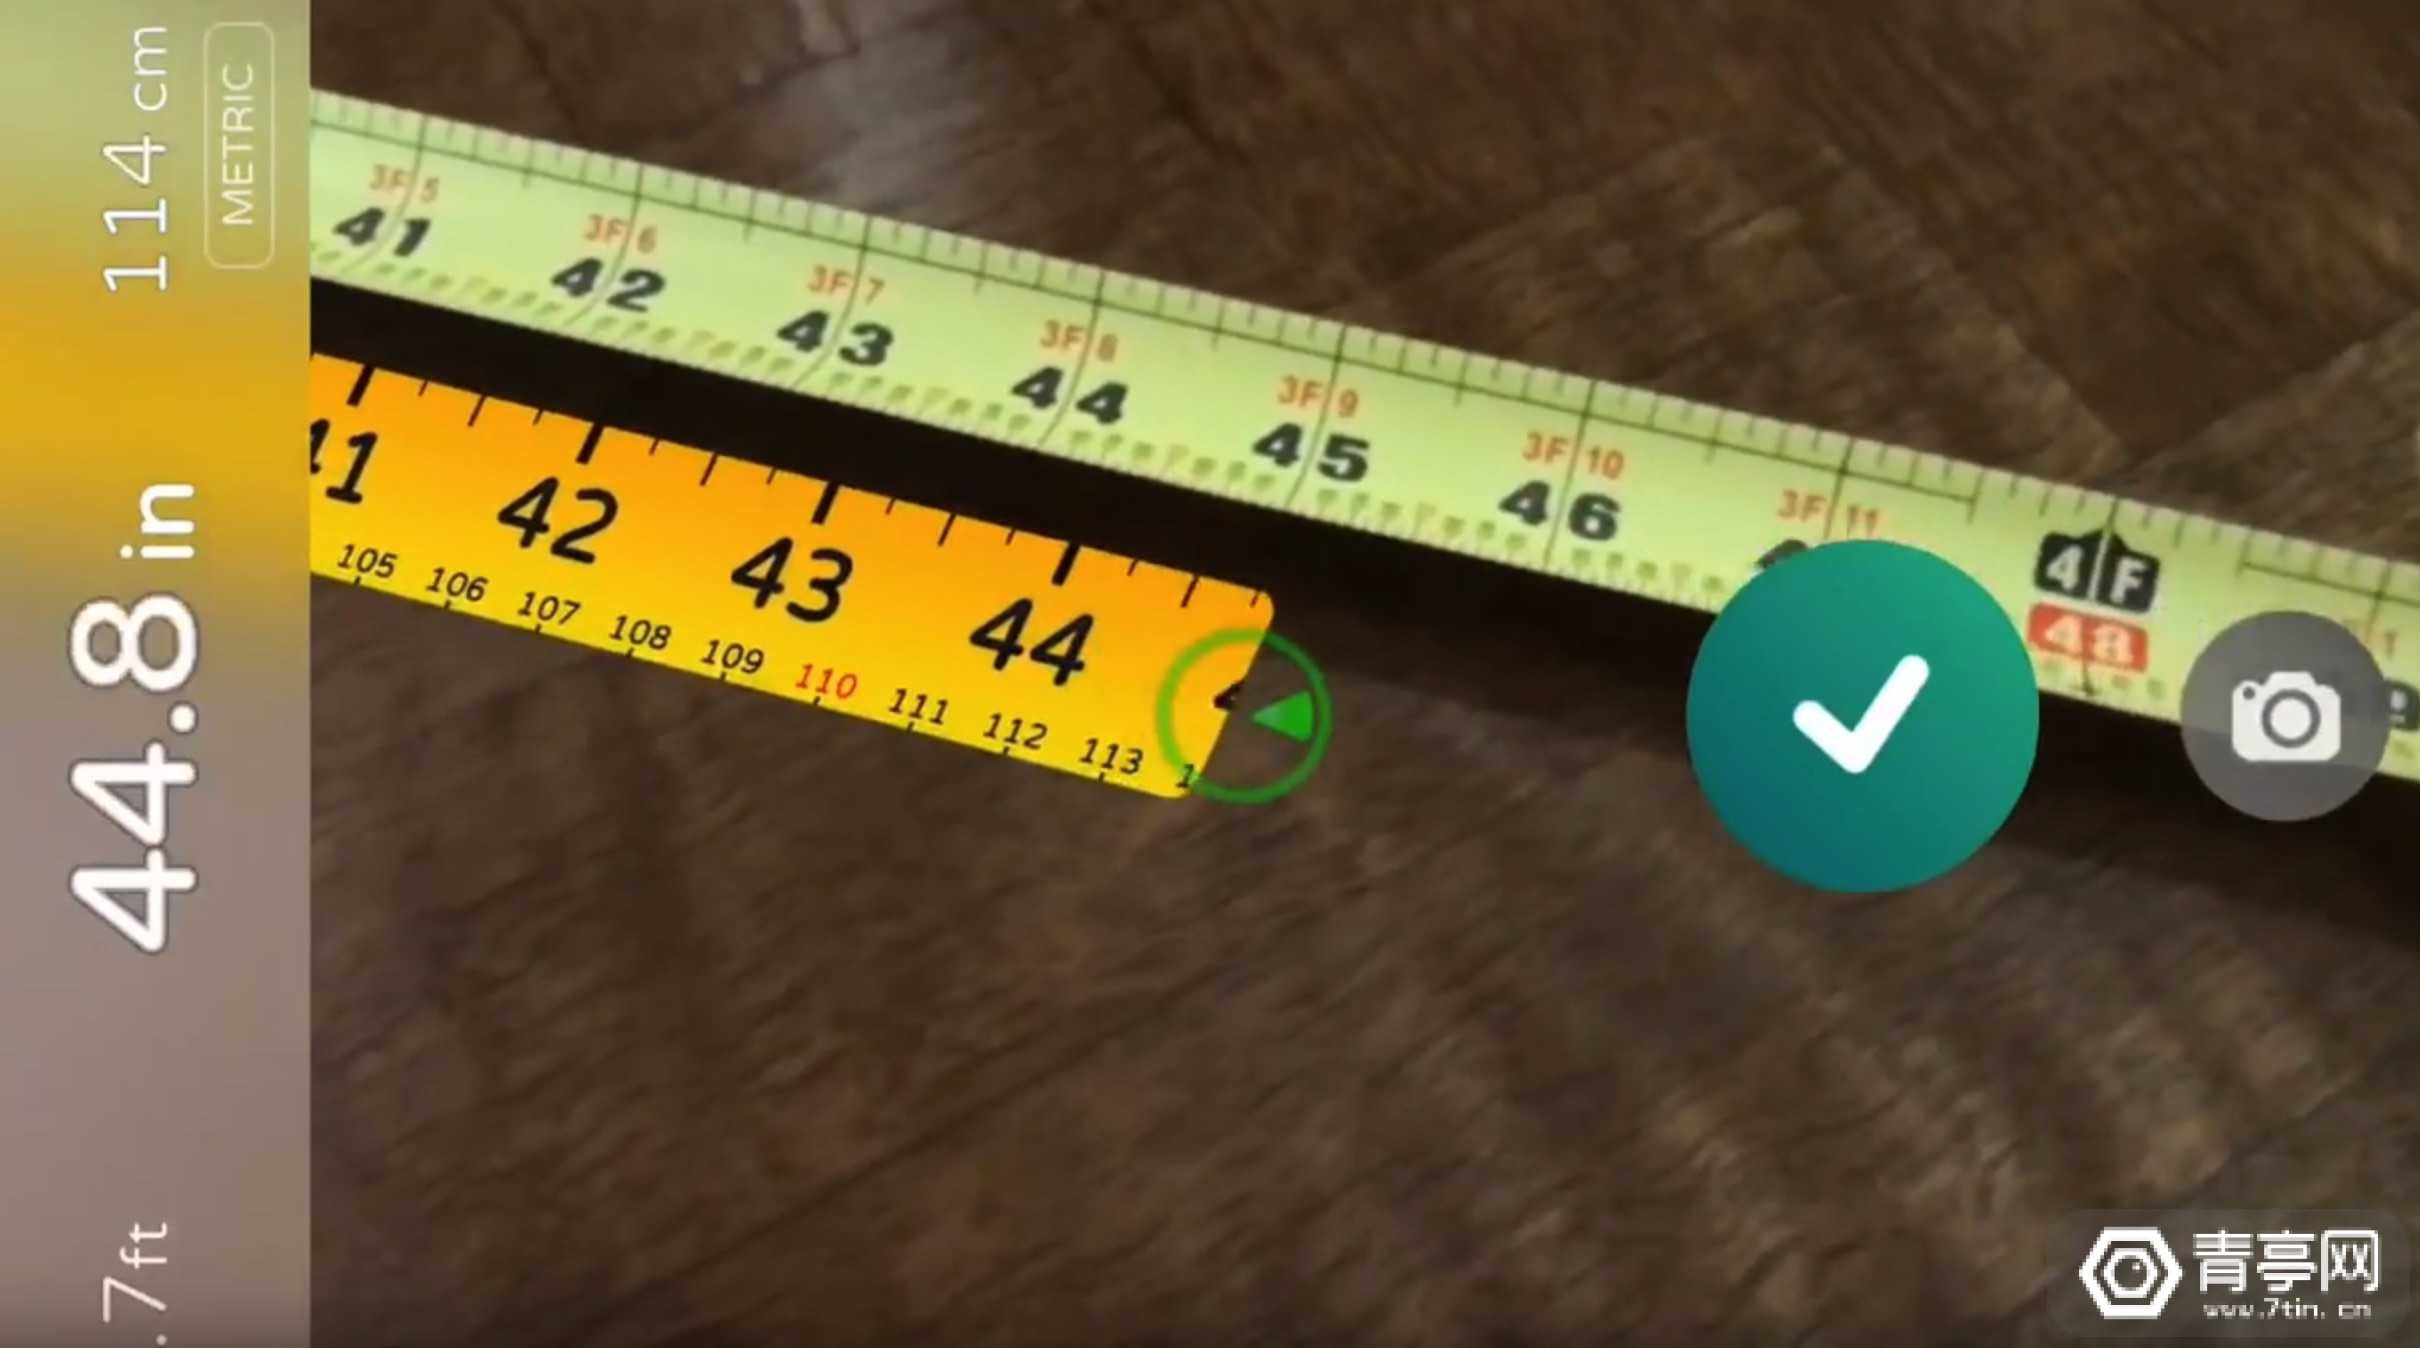 苹果AR测量应用《Measure》专利公开